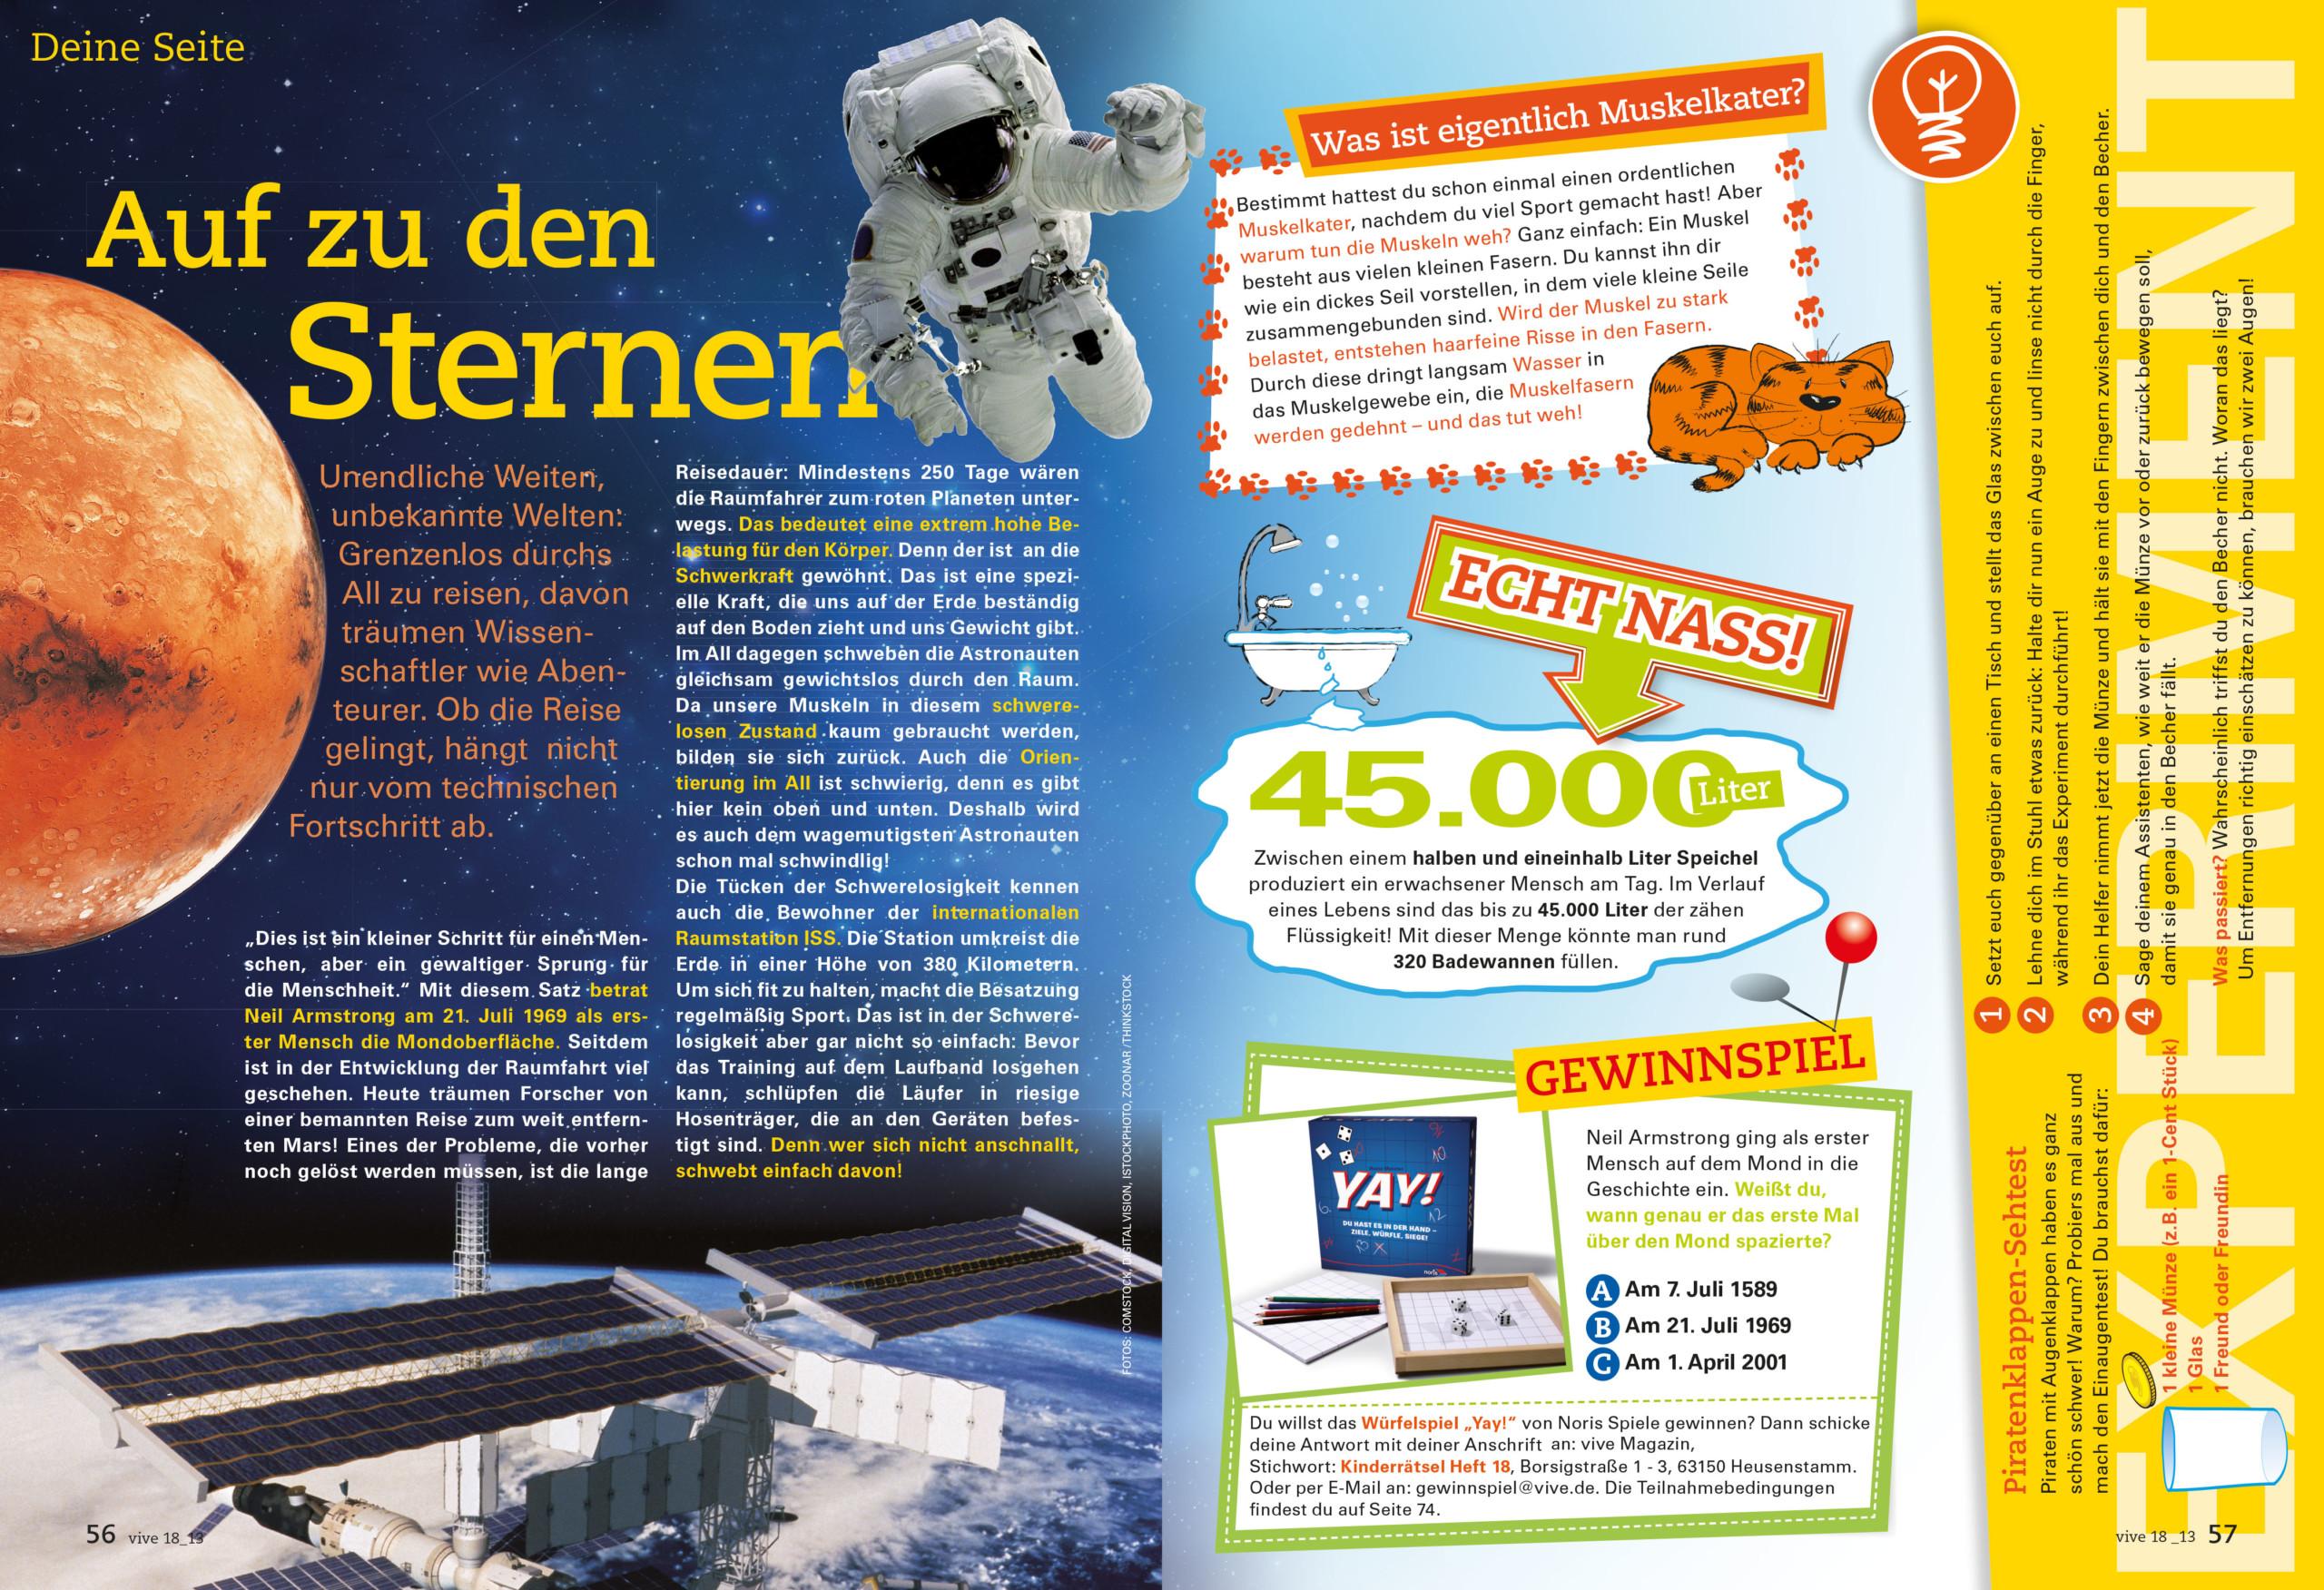 VIVE / ALPHEGA Kundenmagazin – Kinderseiten Thema Sterne